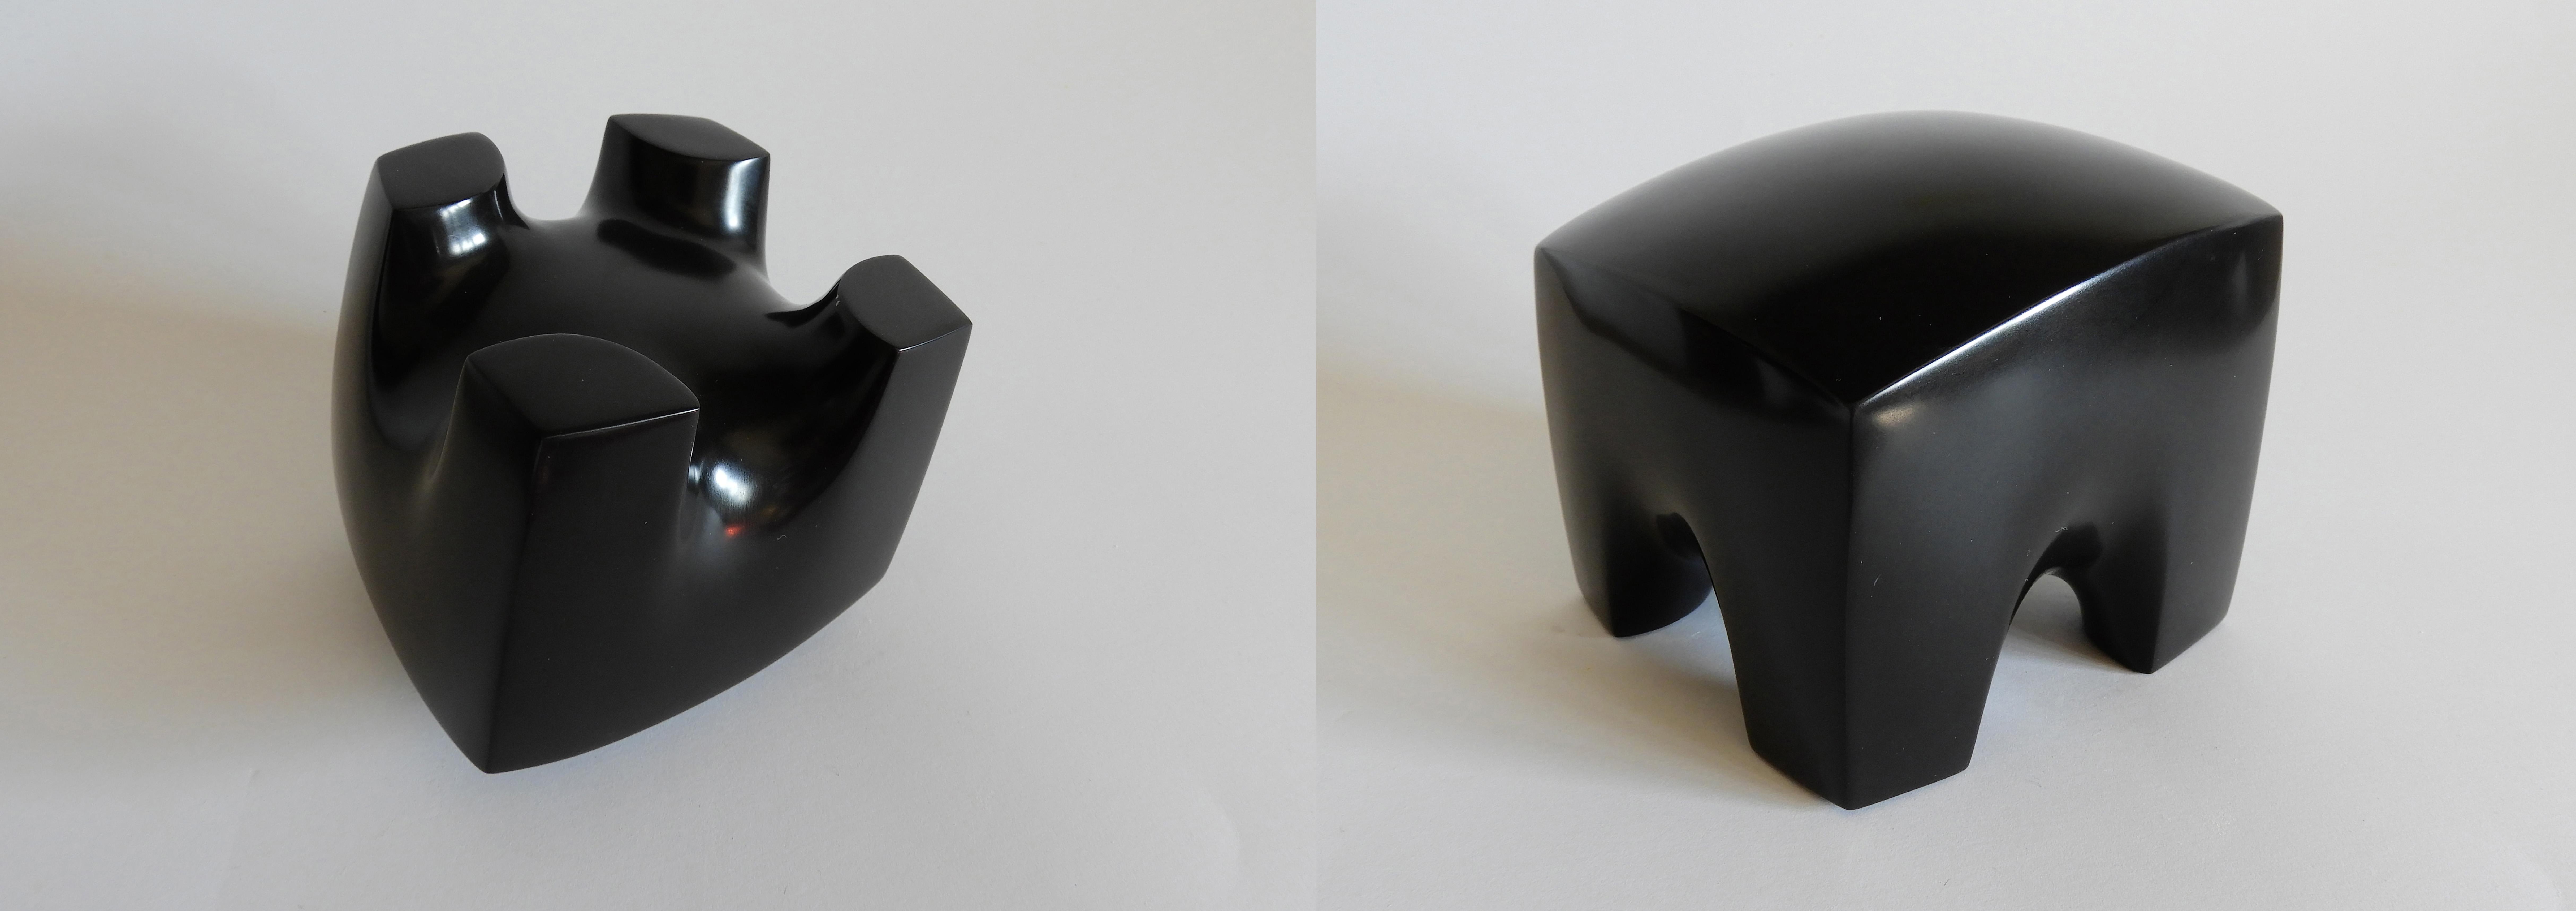 Gravity - h 9 x 11 x 11 cm  black belgian marble  2018